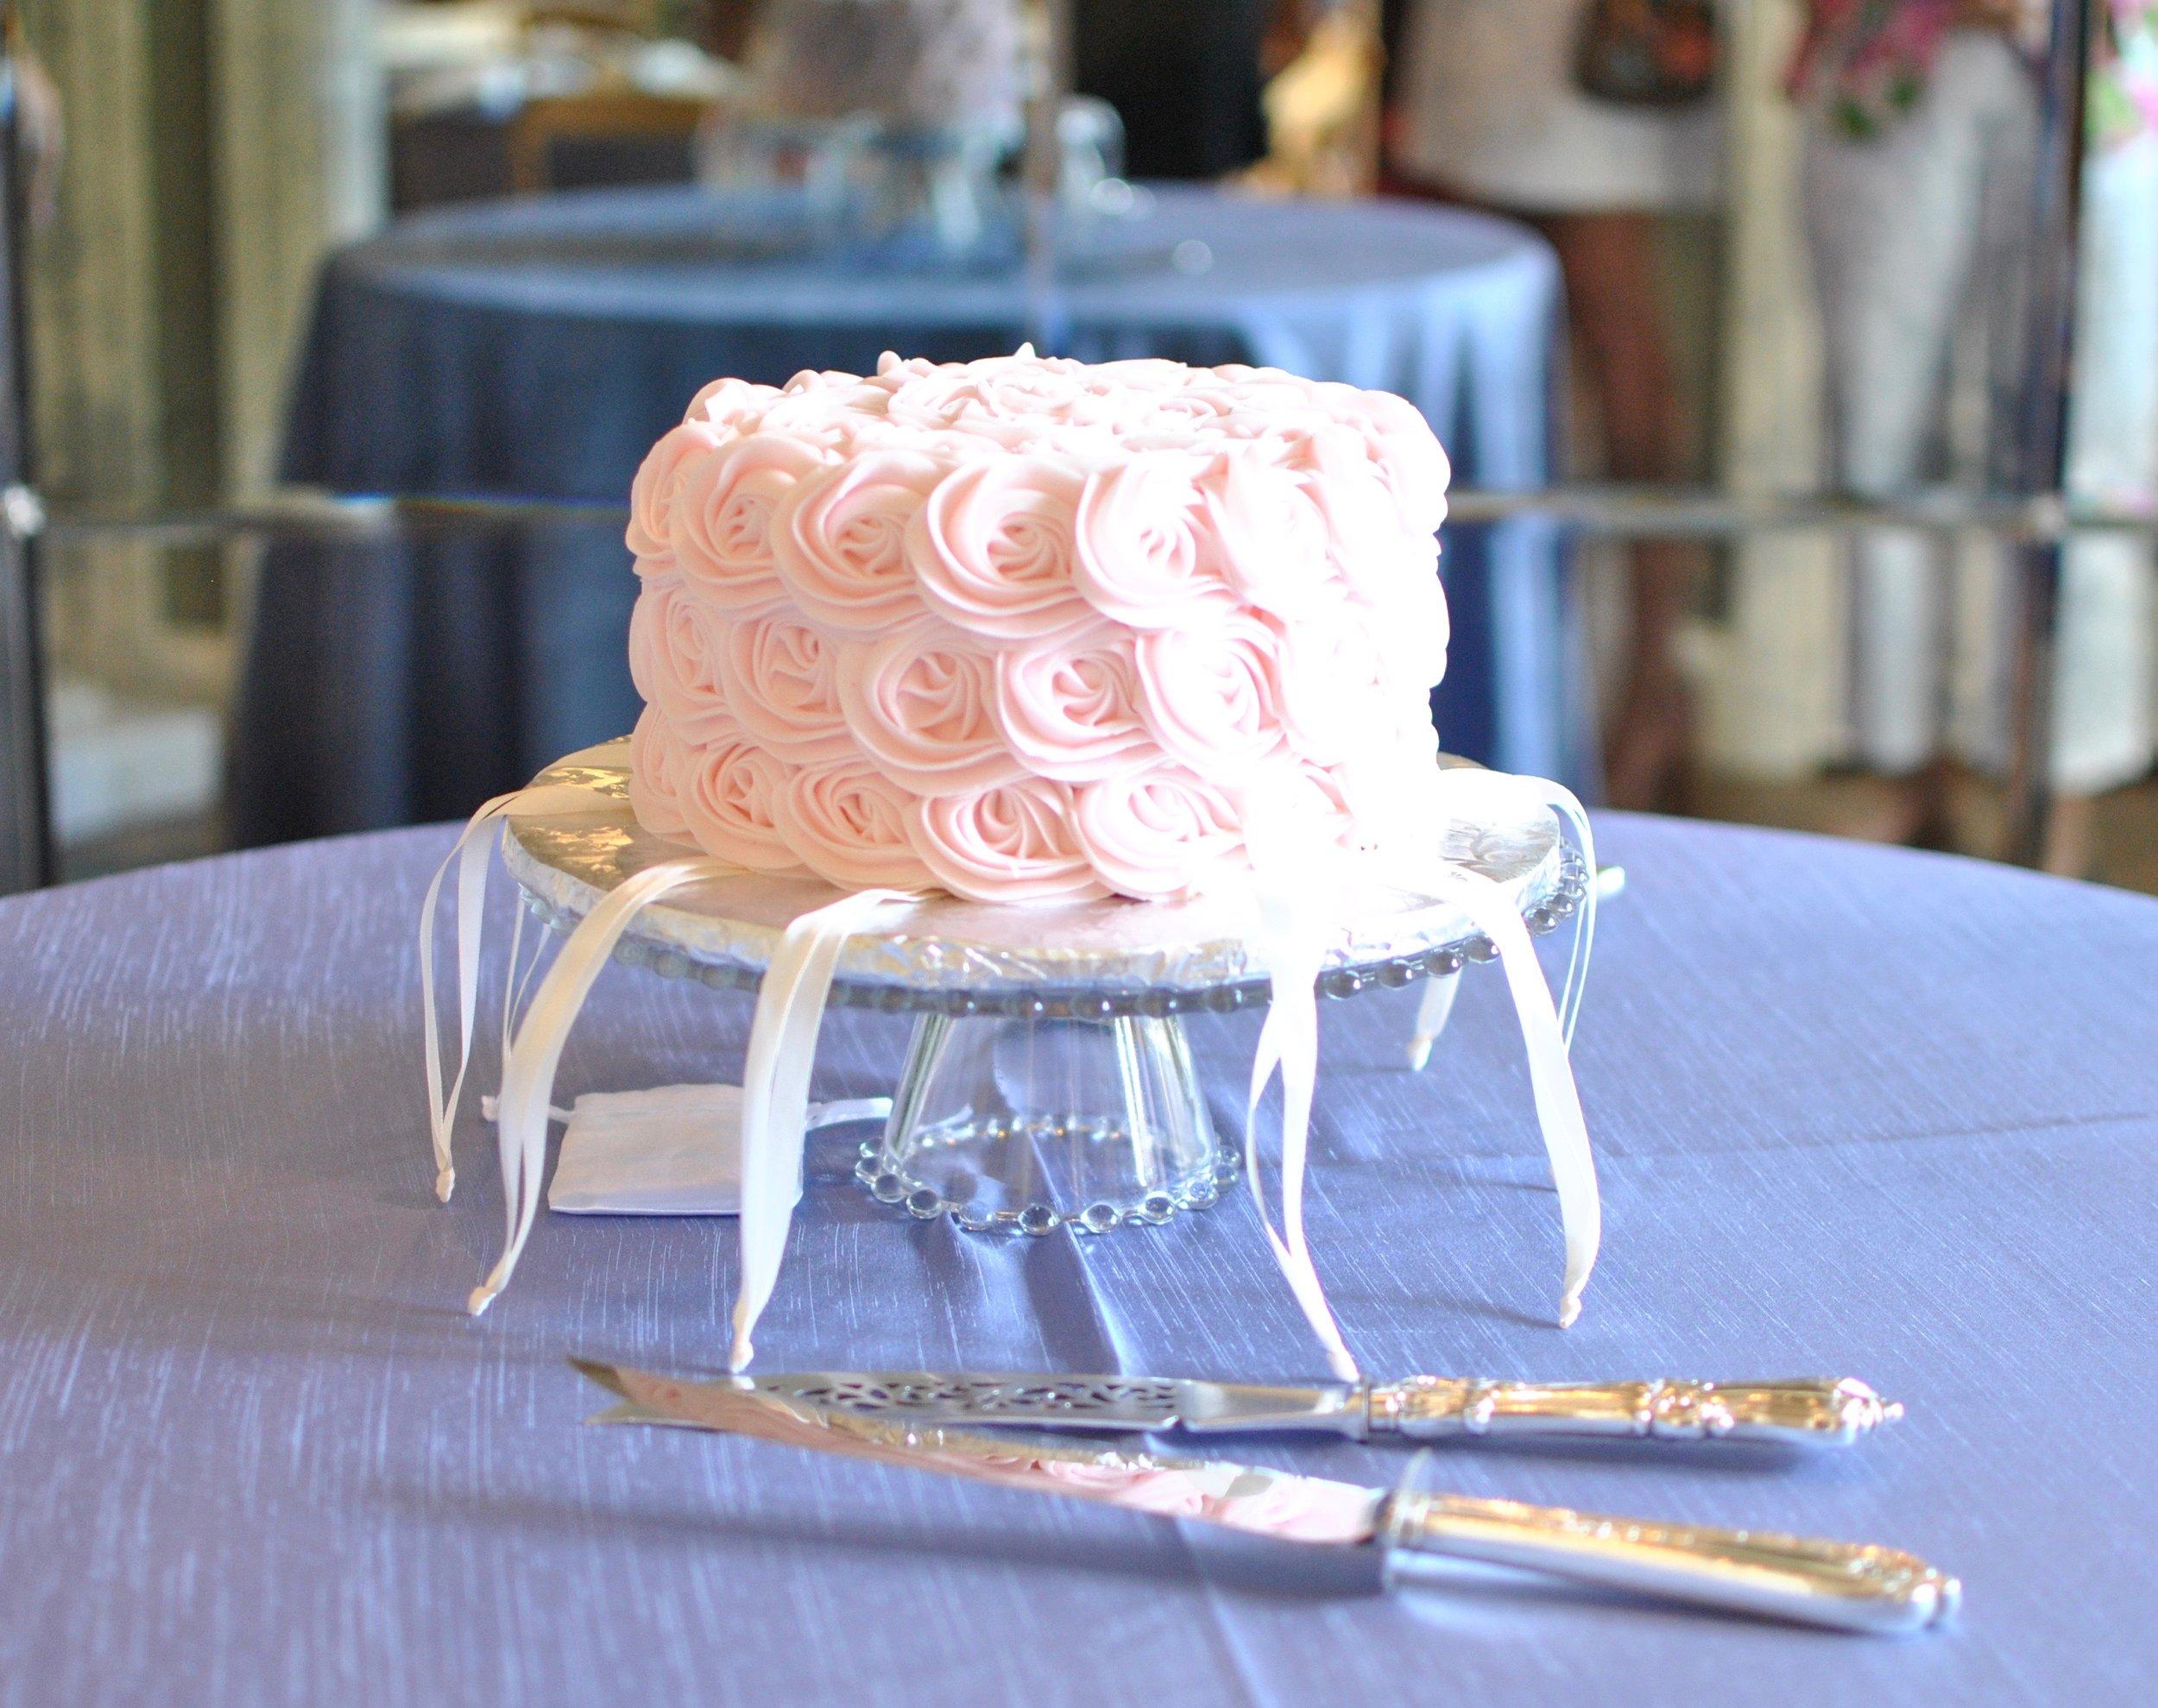 Bridesmaids cake from Main St. Cakes in Burlington